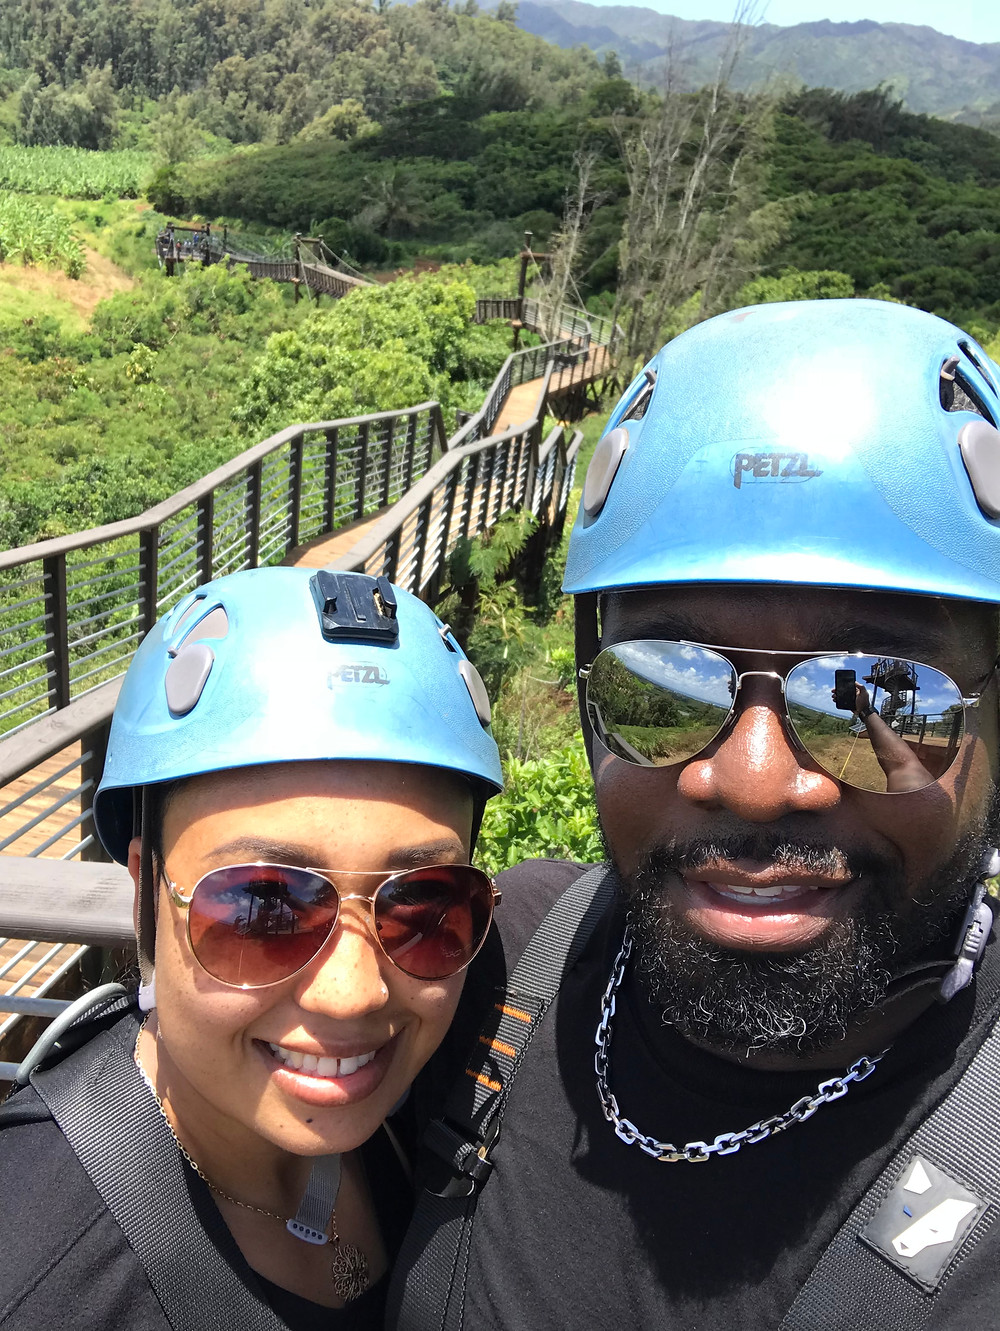 Married interracial couple zip-lining in Oahu, Hawaii